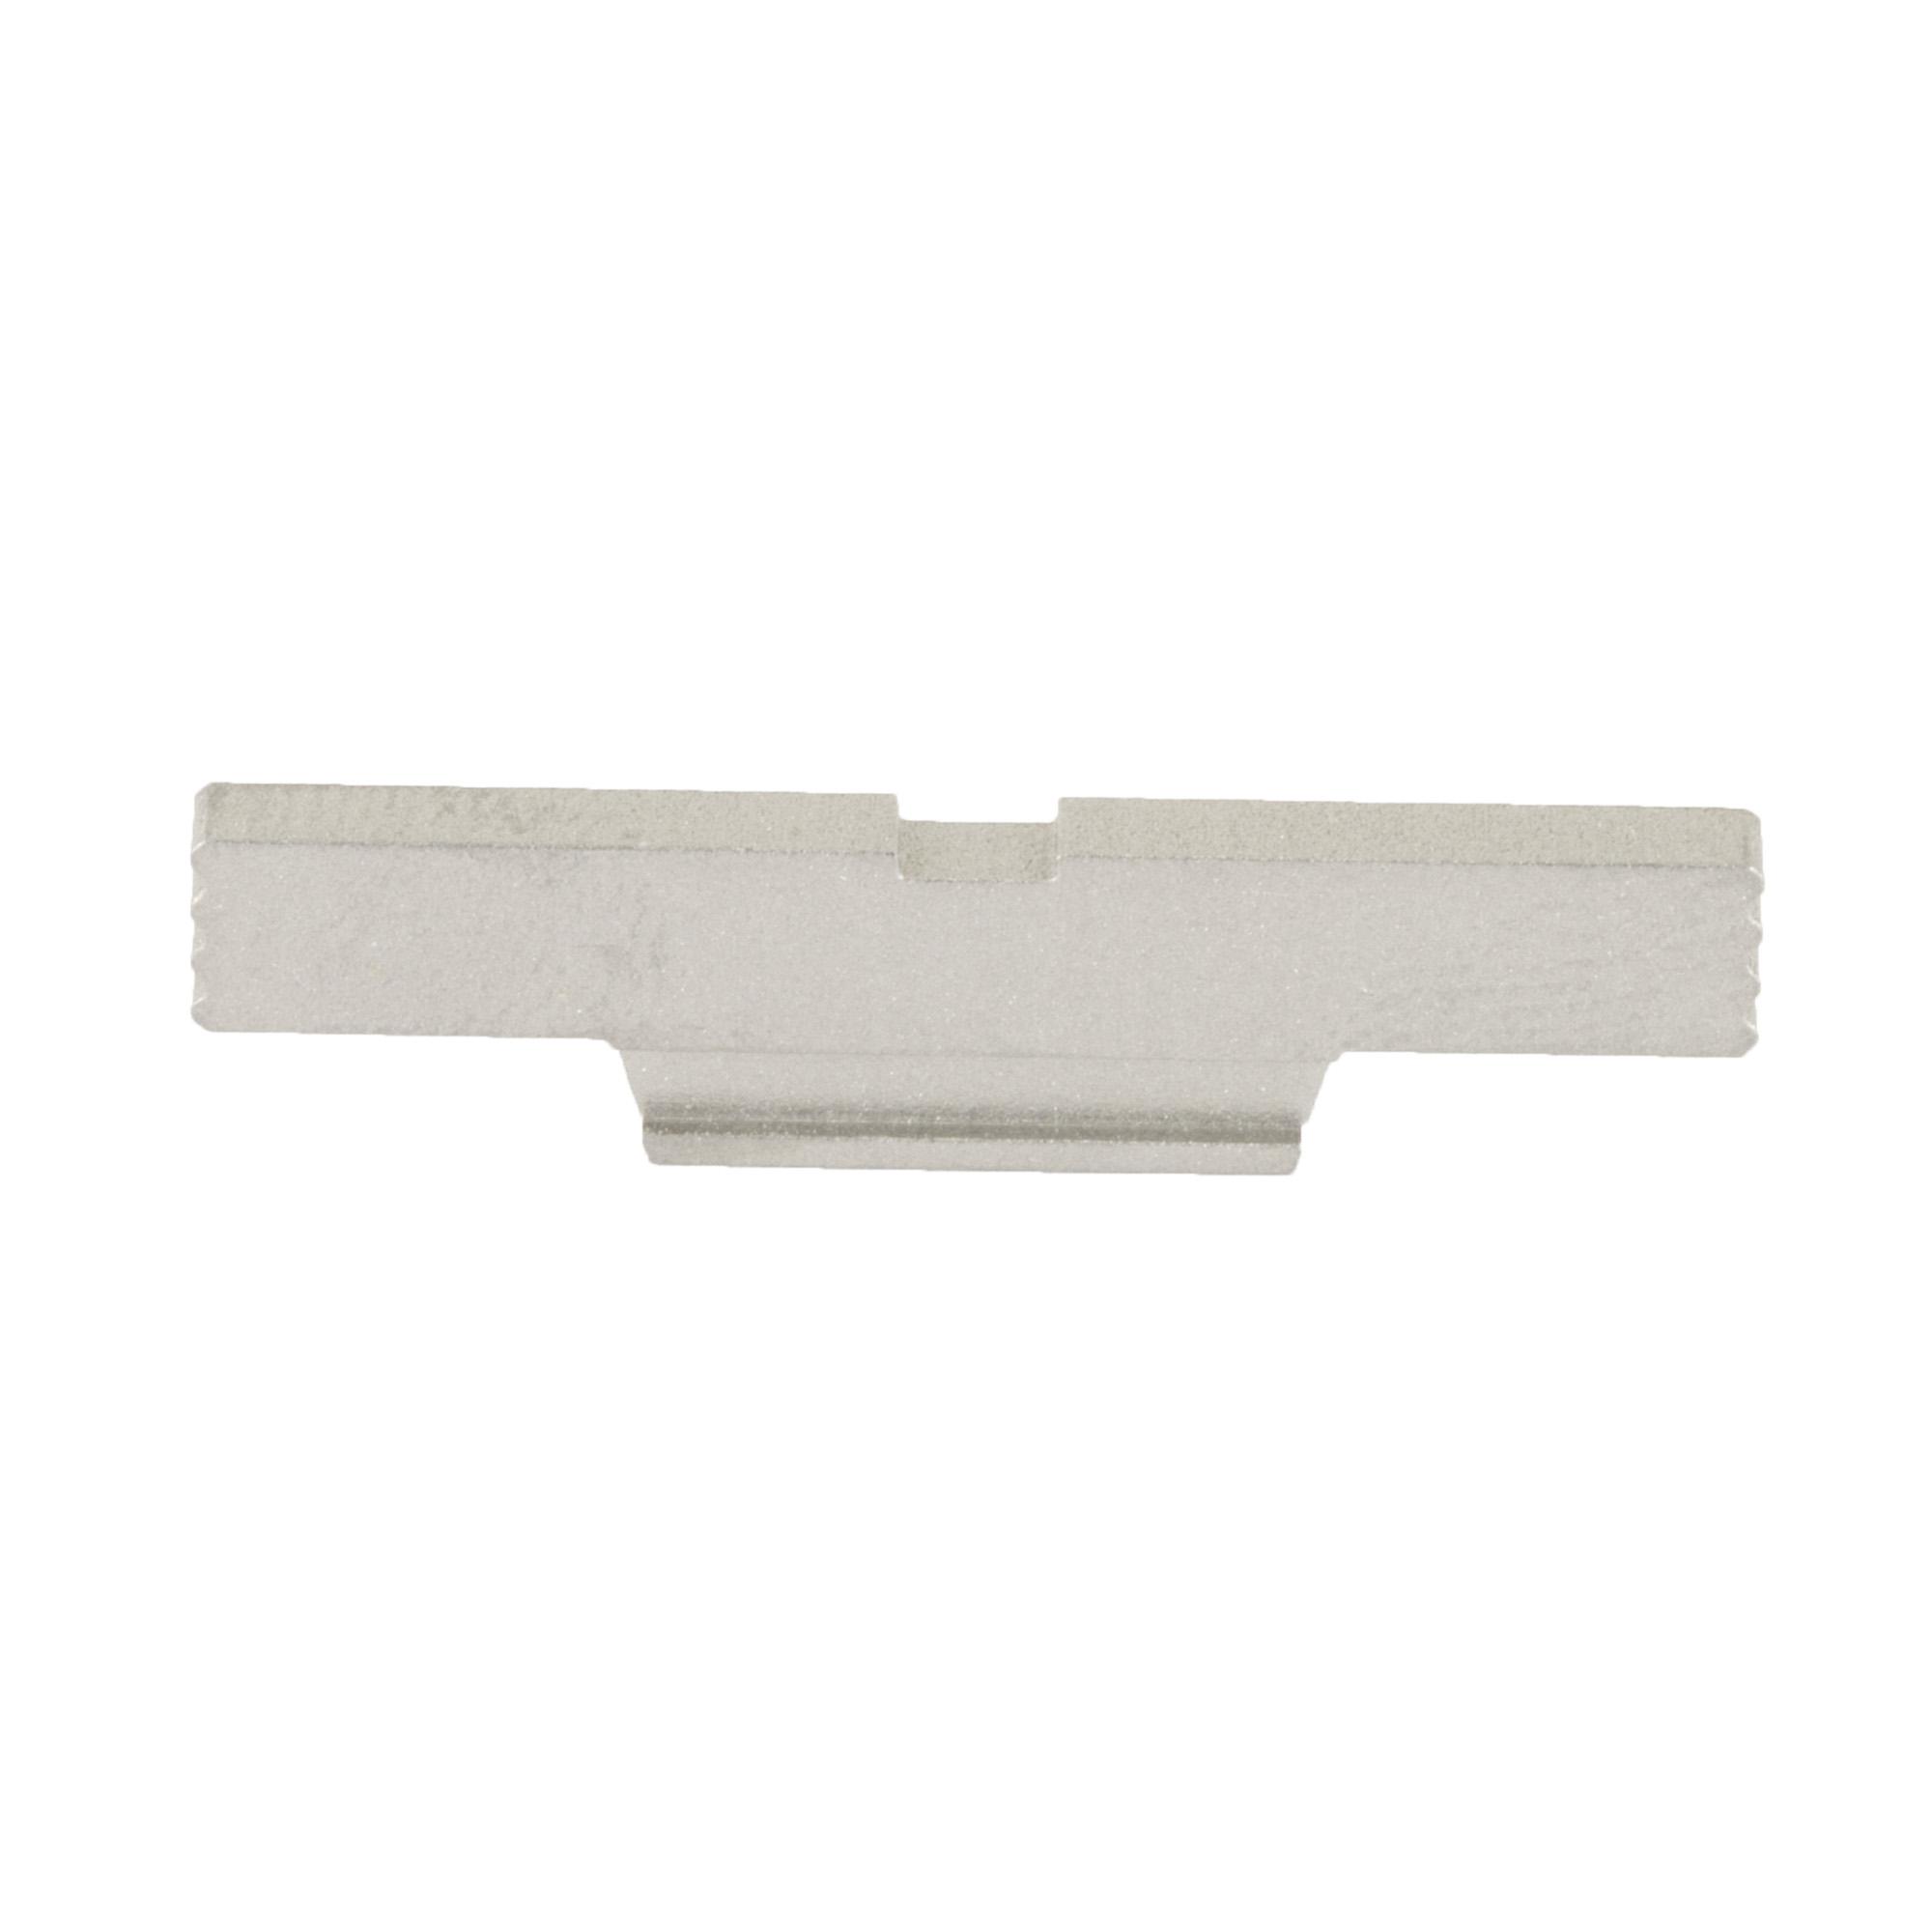 Bastion Glock Extended Slide Lock Lever